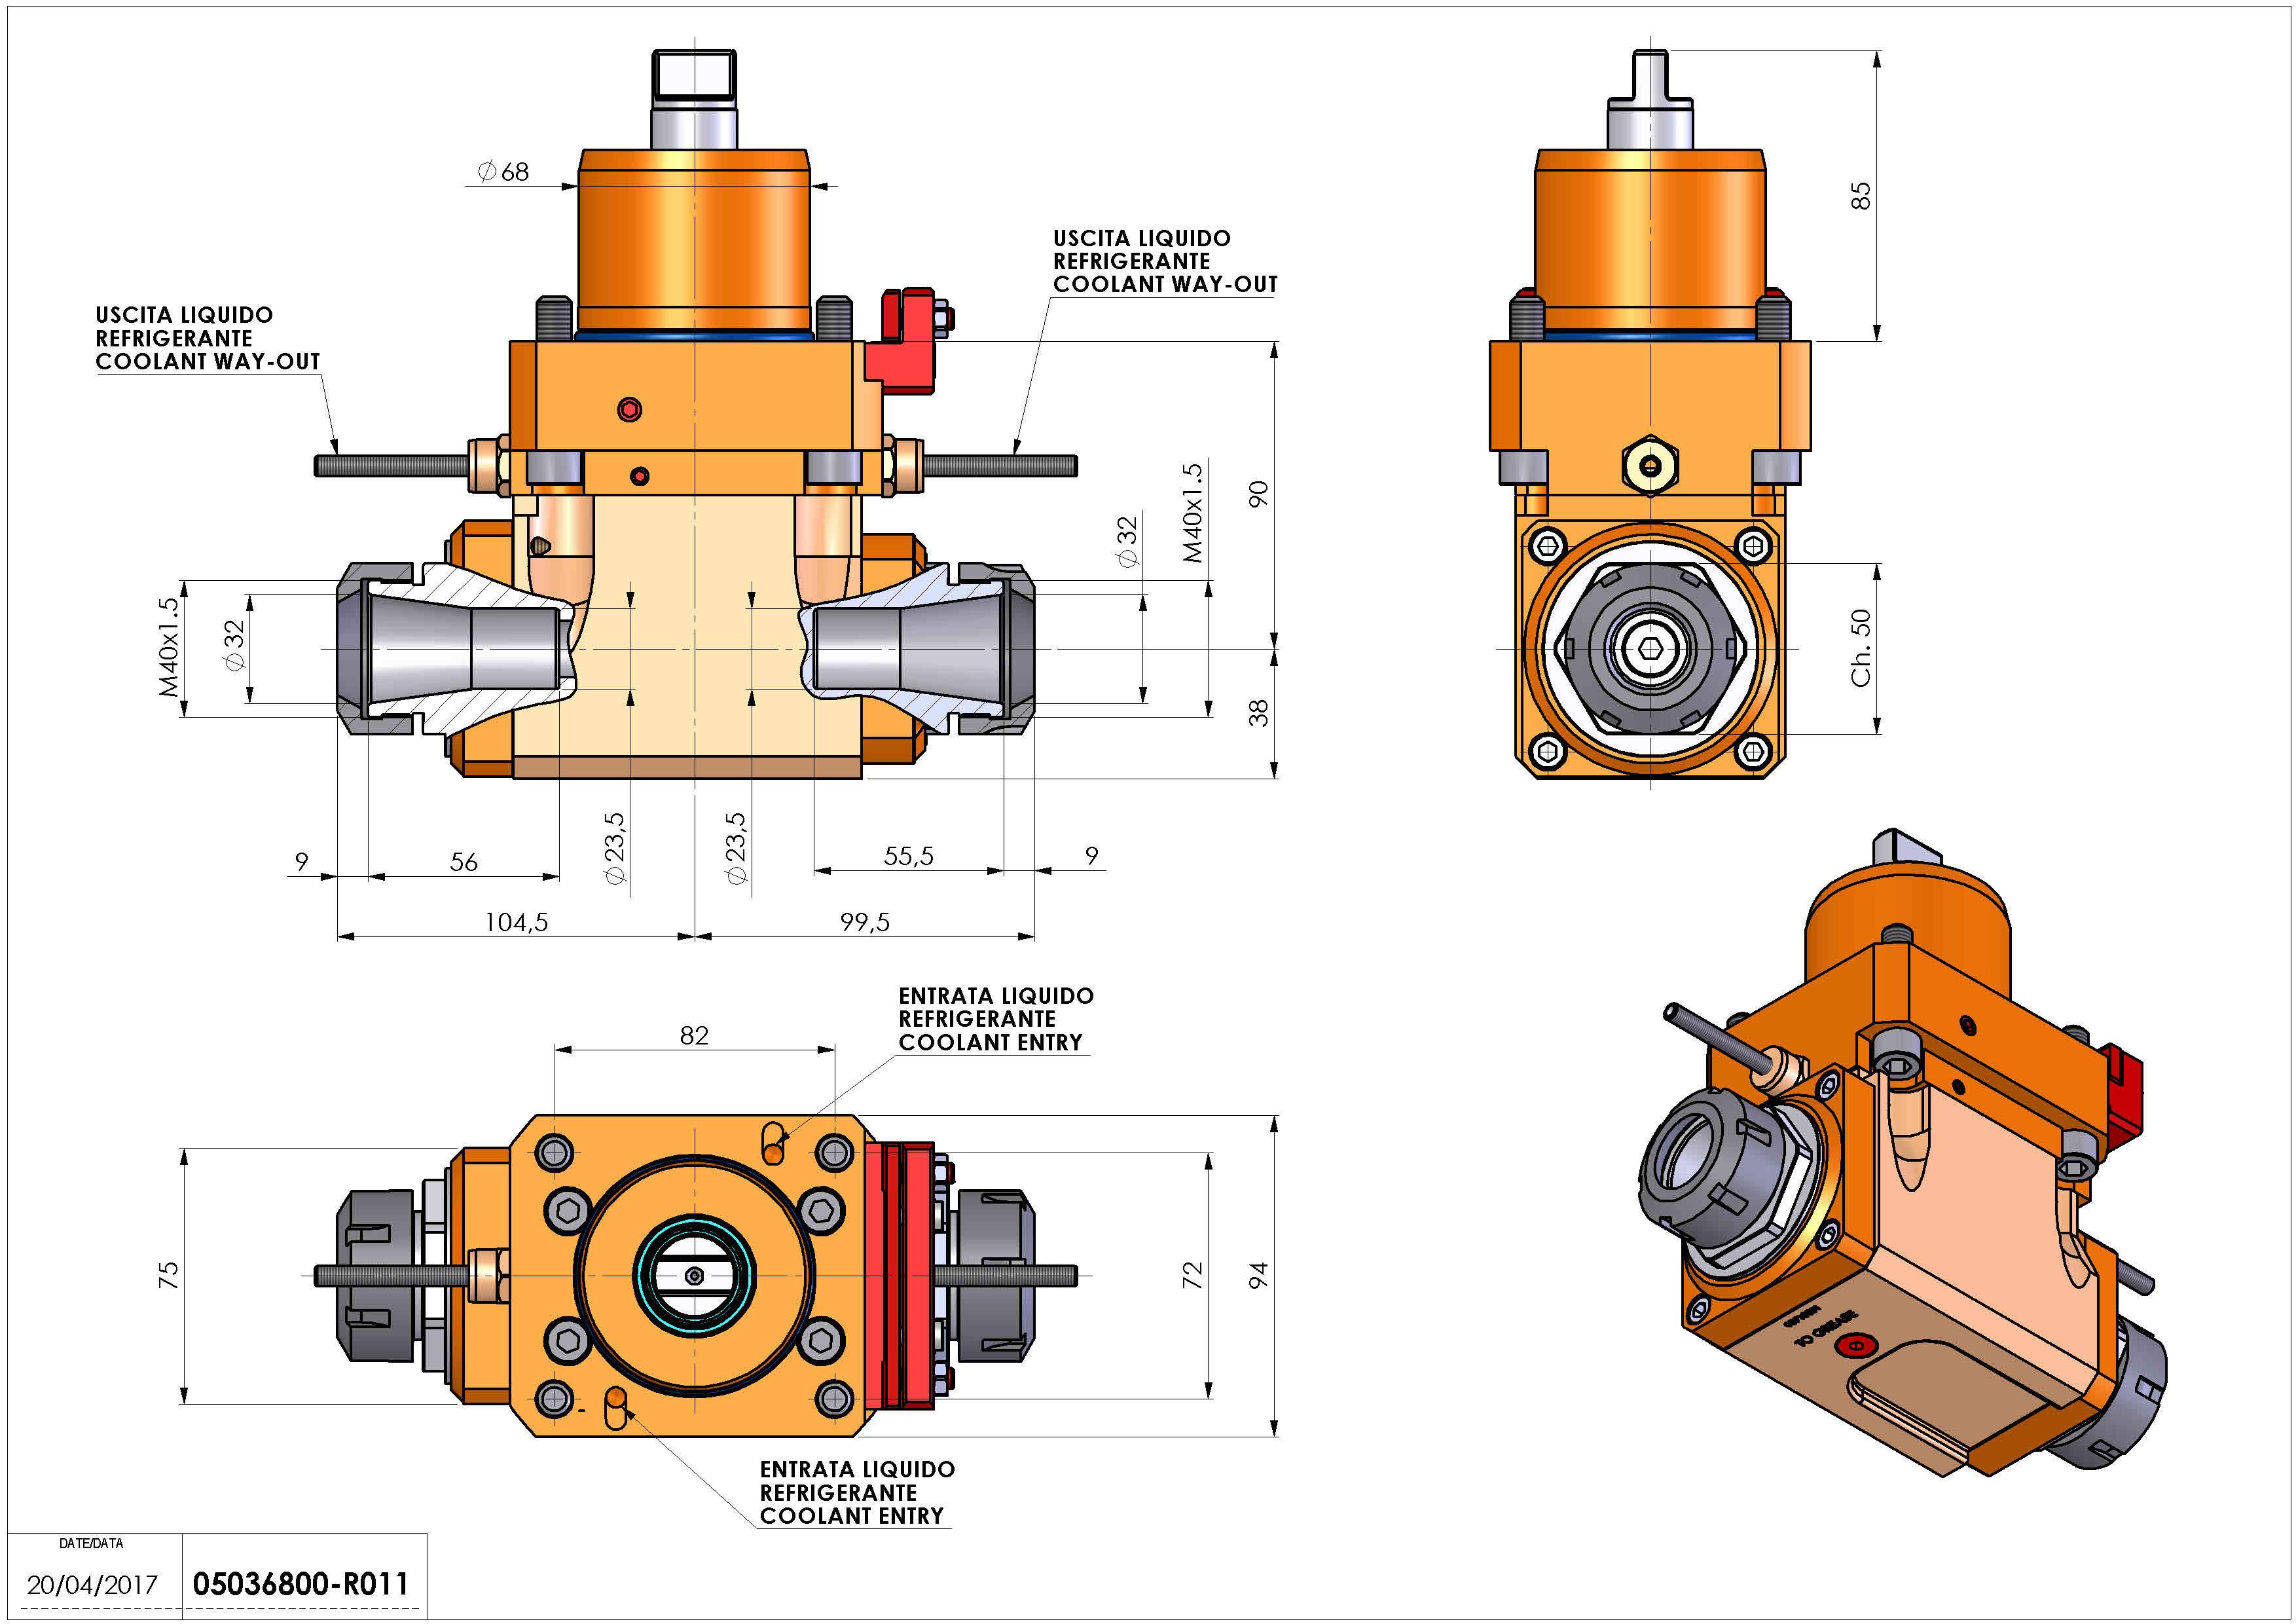 Technical image - LT-A D68 ER32-32 H90 TWJ.